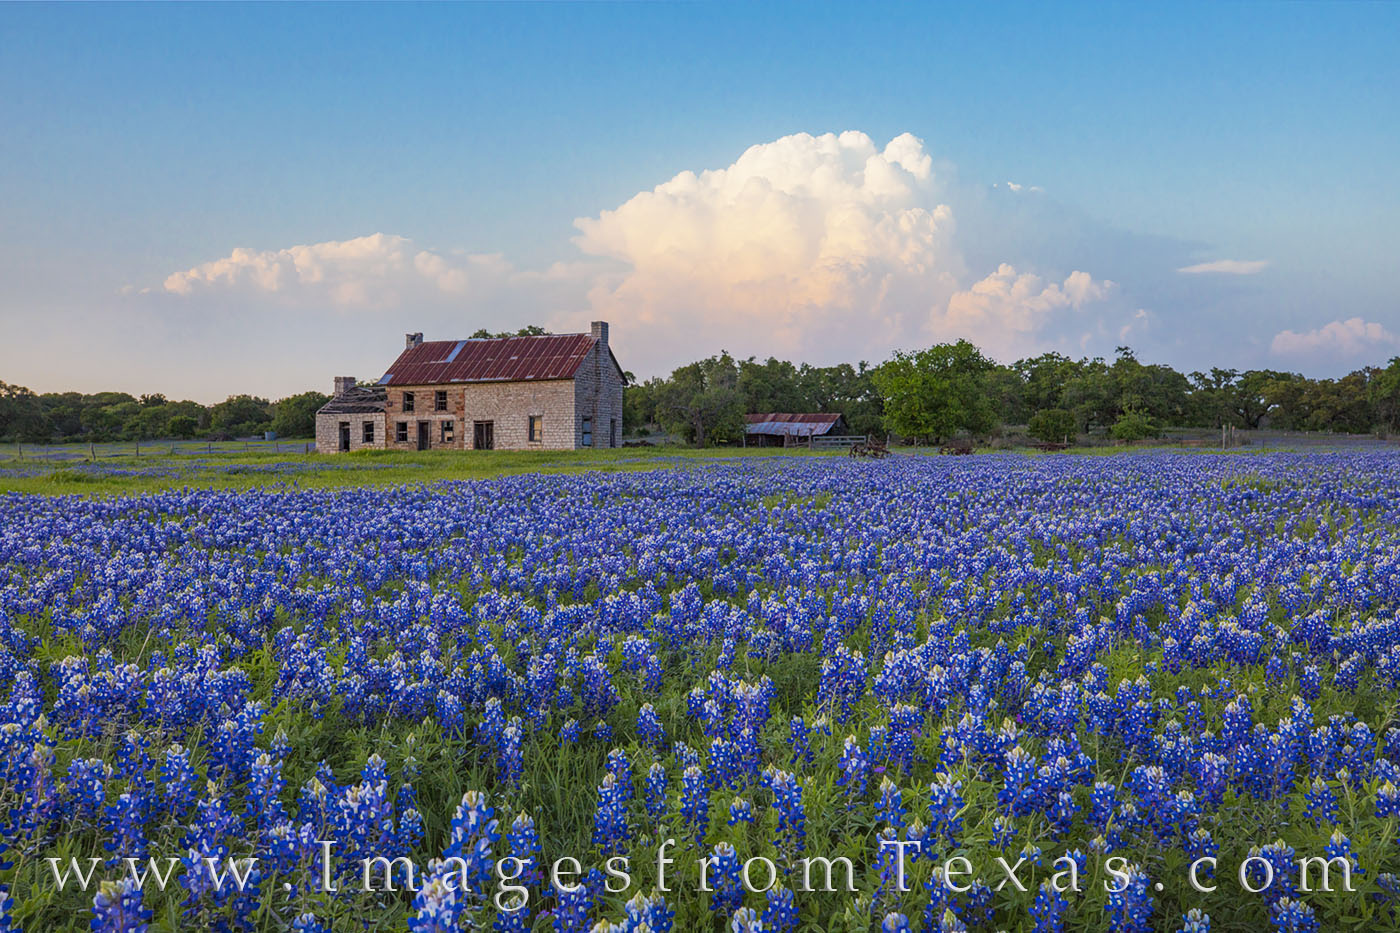 thunderheads, storms, bluebonnets, bluebonnet house, marble falls, wildlfowers, texas wildflowers, texas bluebonnets, bluebonnet images, photo